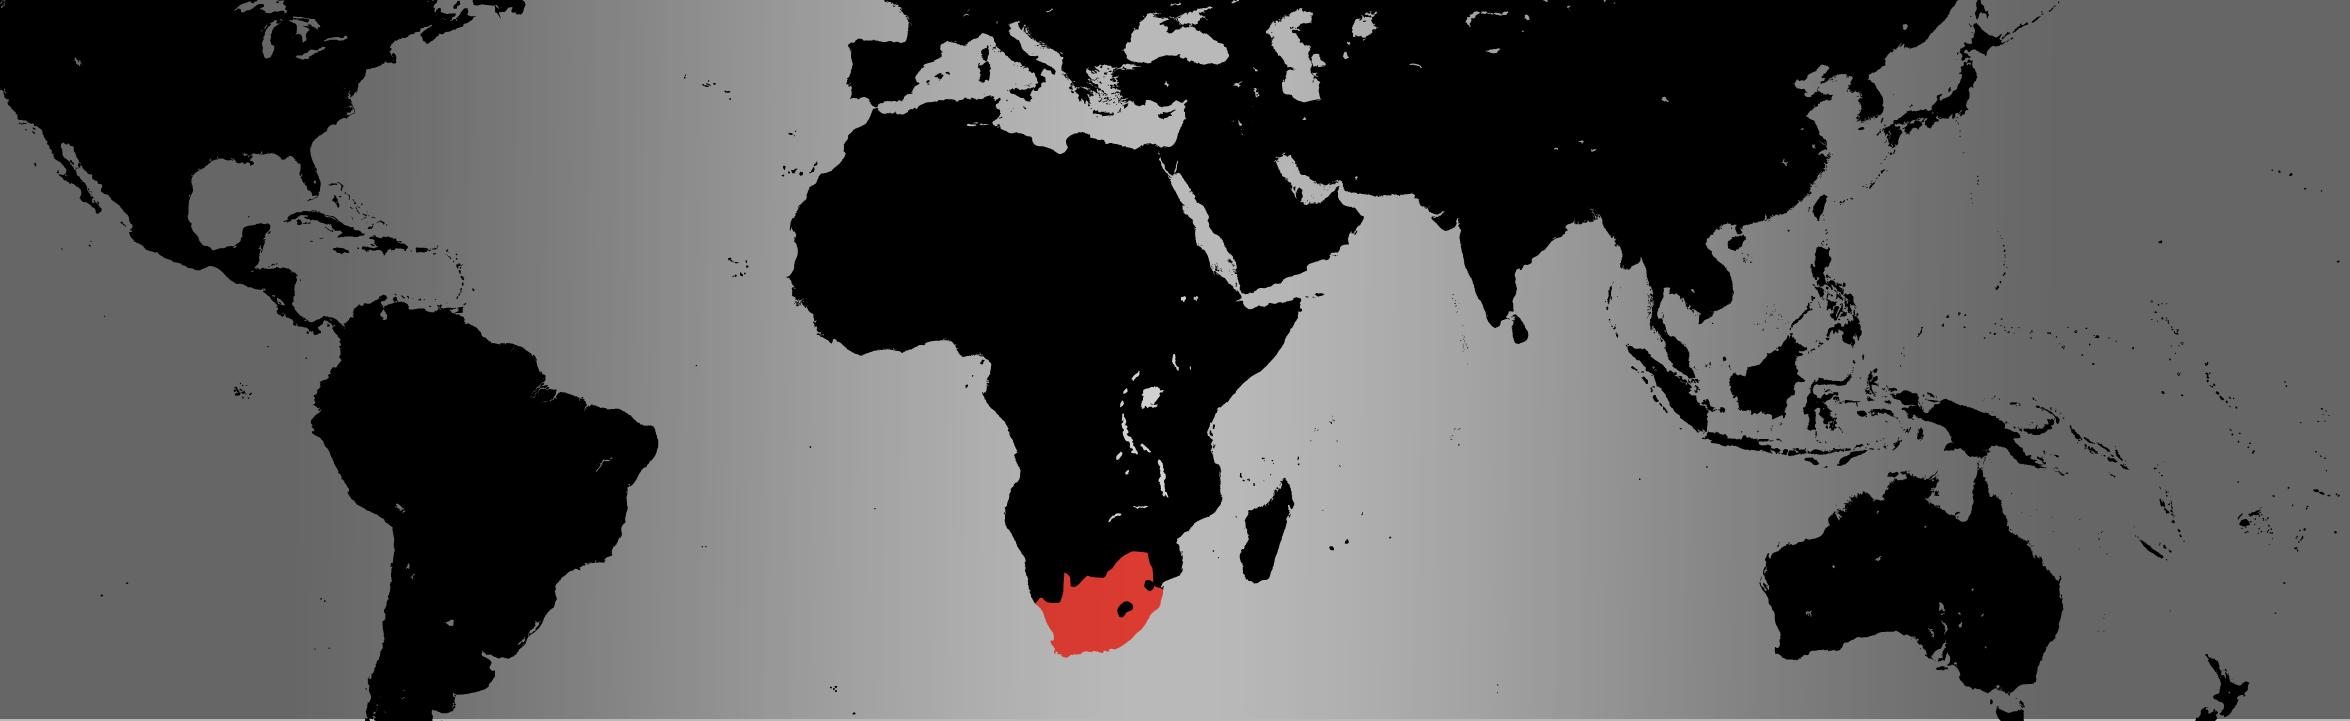 black crowned crane map